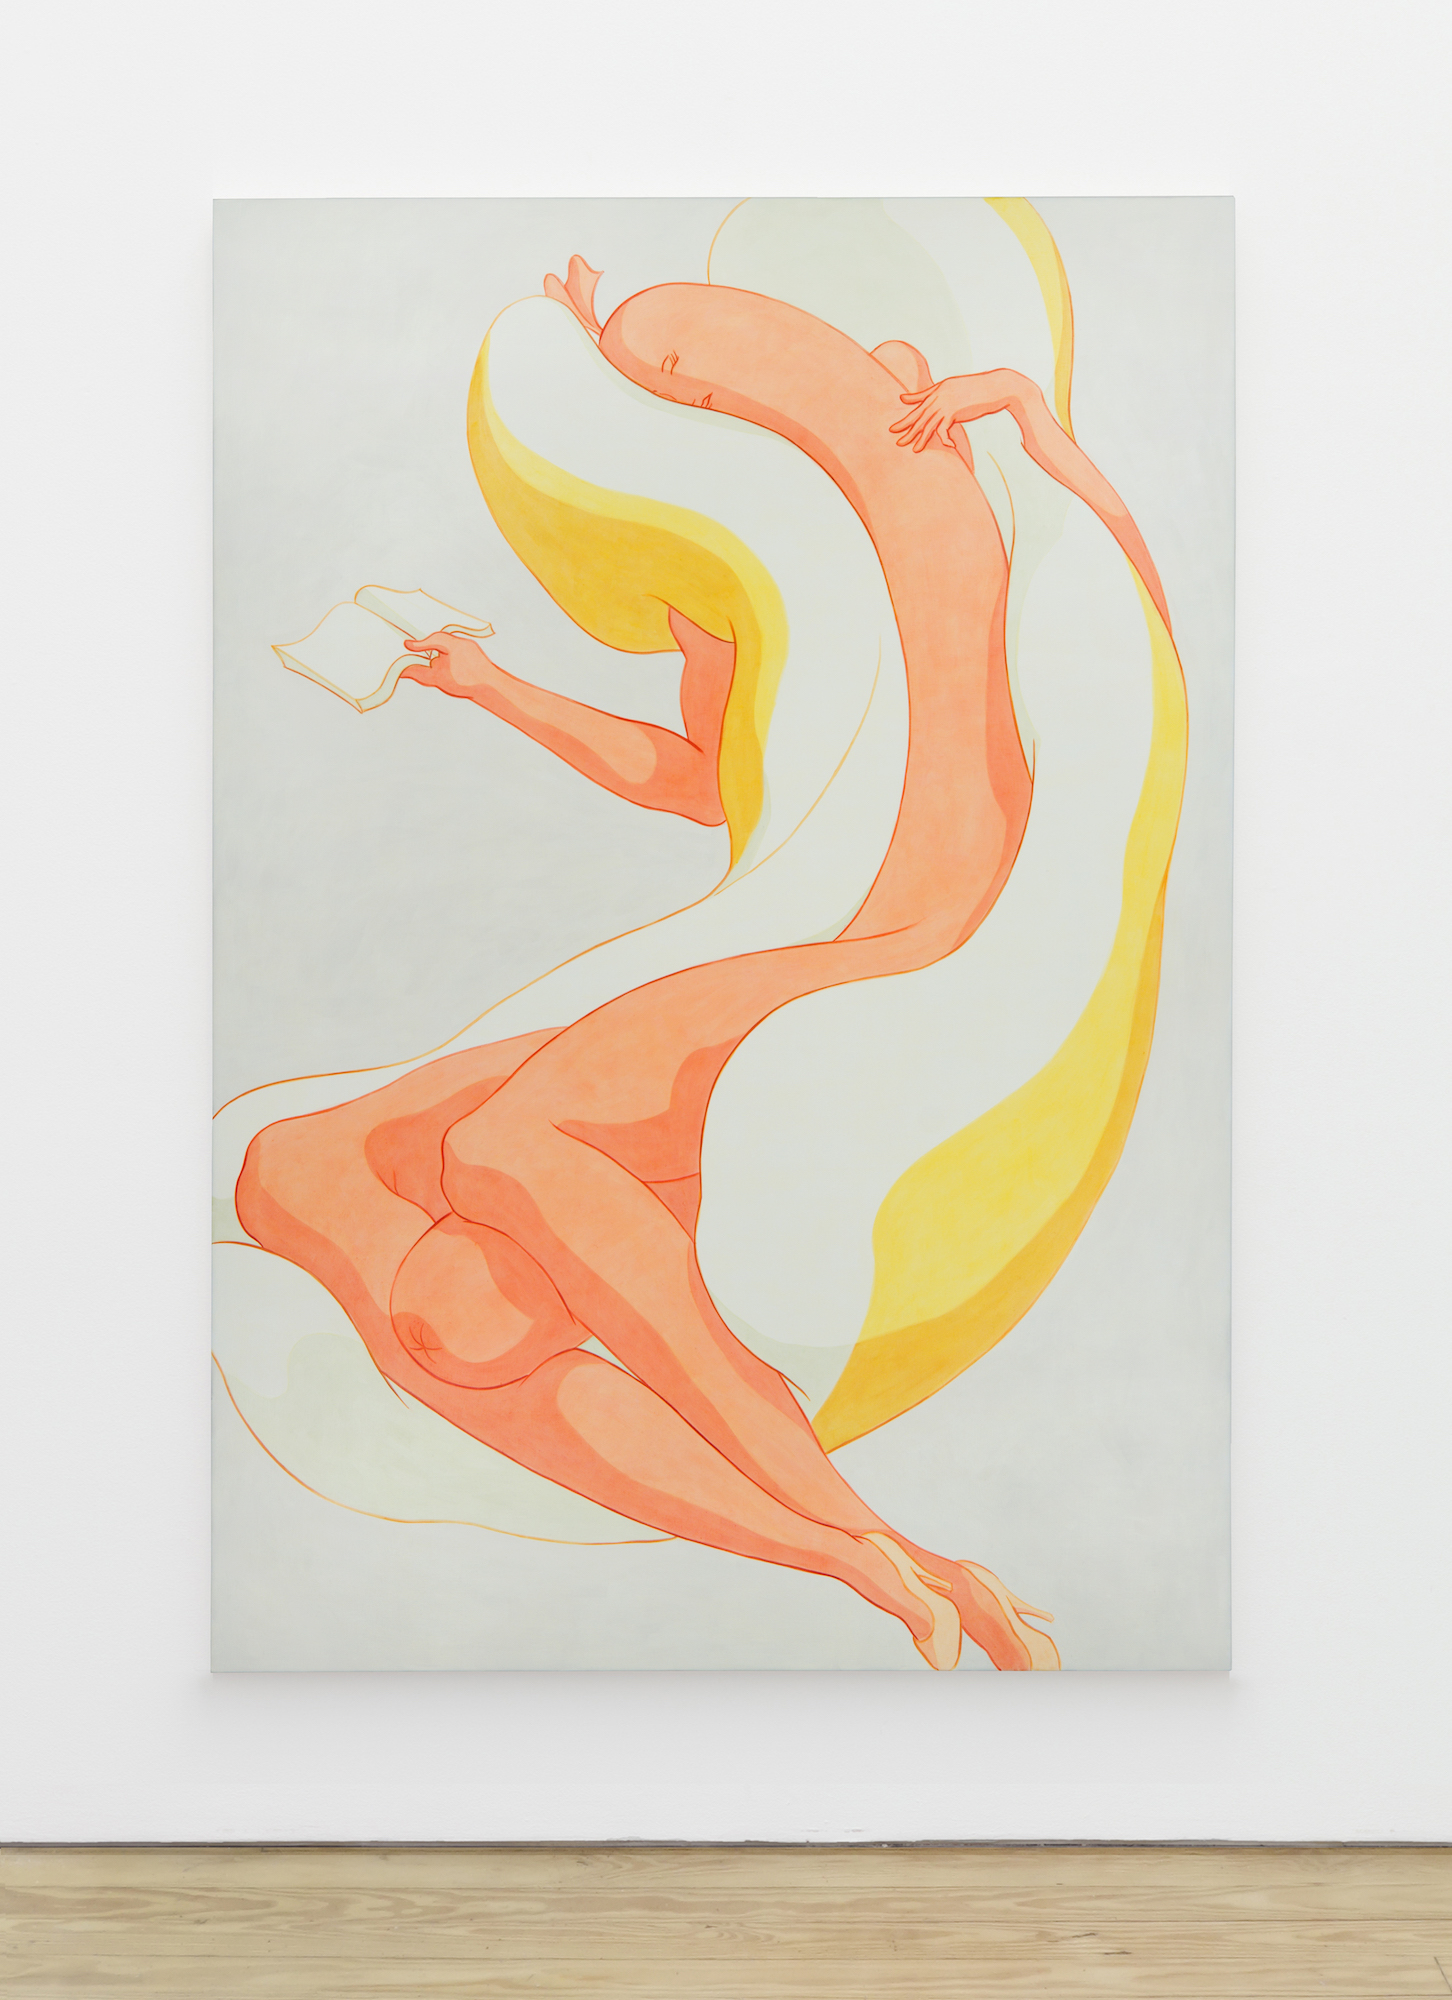 Ivy Haldeman,  Sleeping Figure, Face Turned, Fingers Touch Upper Torso, Open Book,  2018